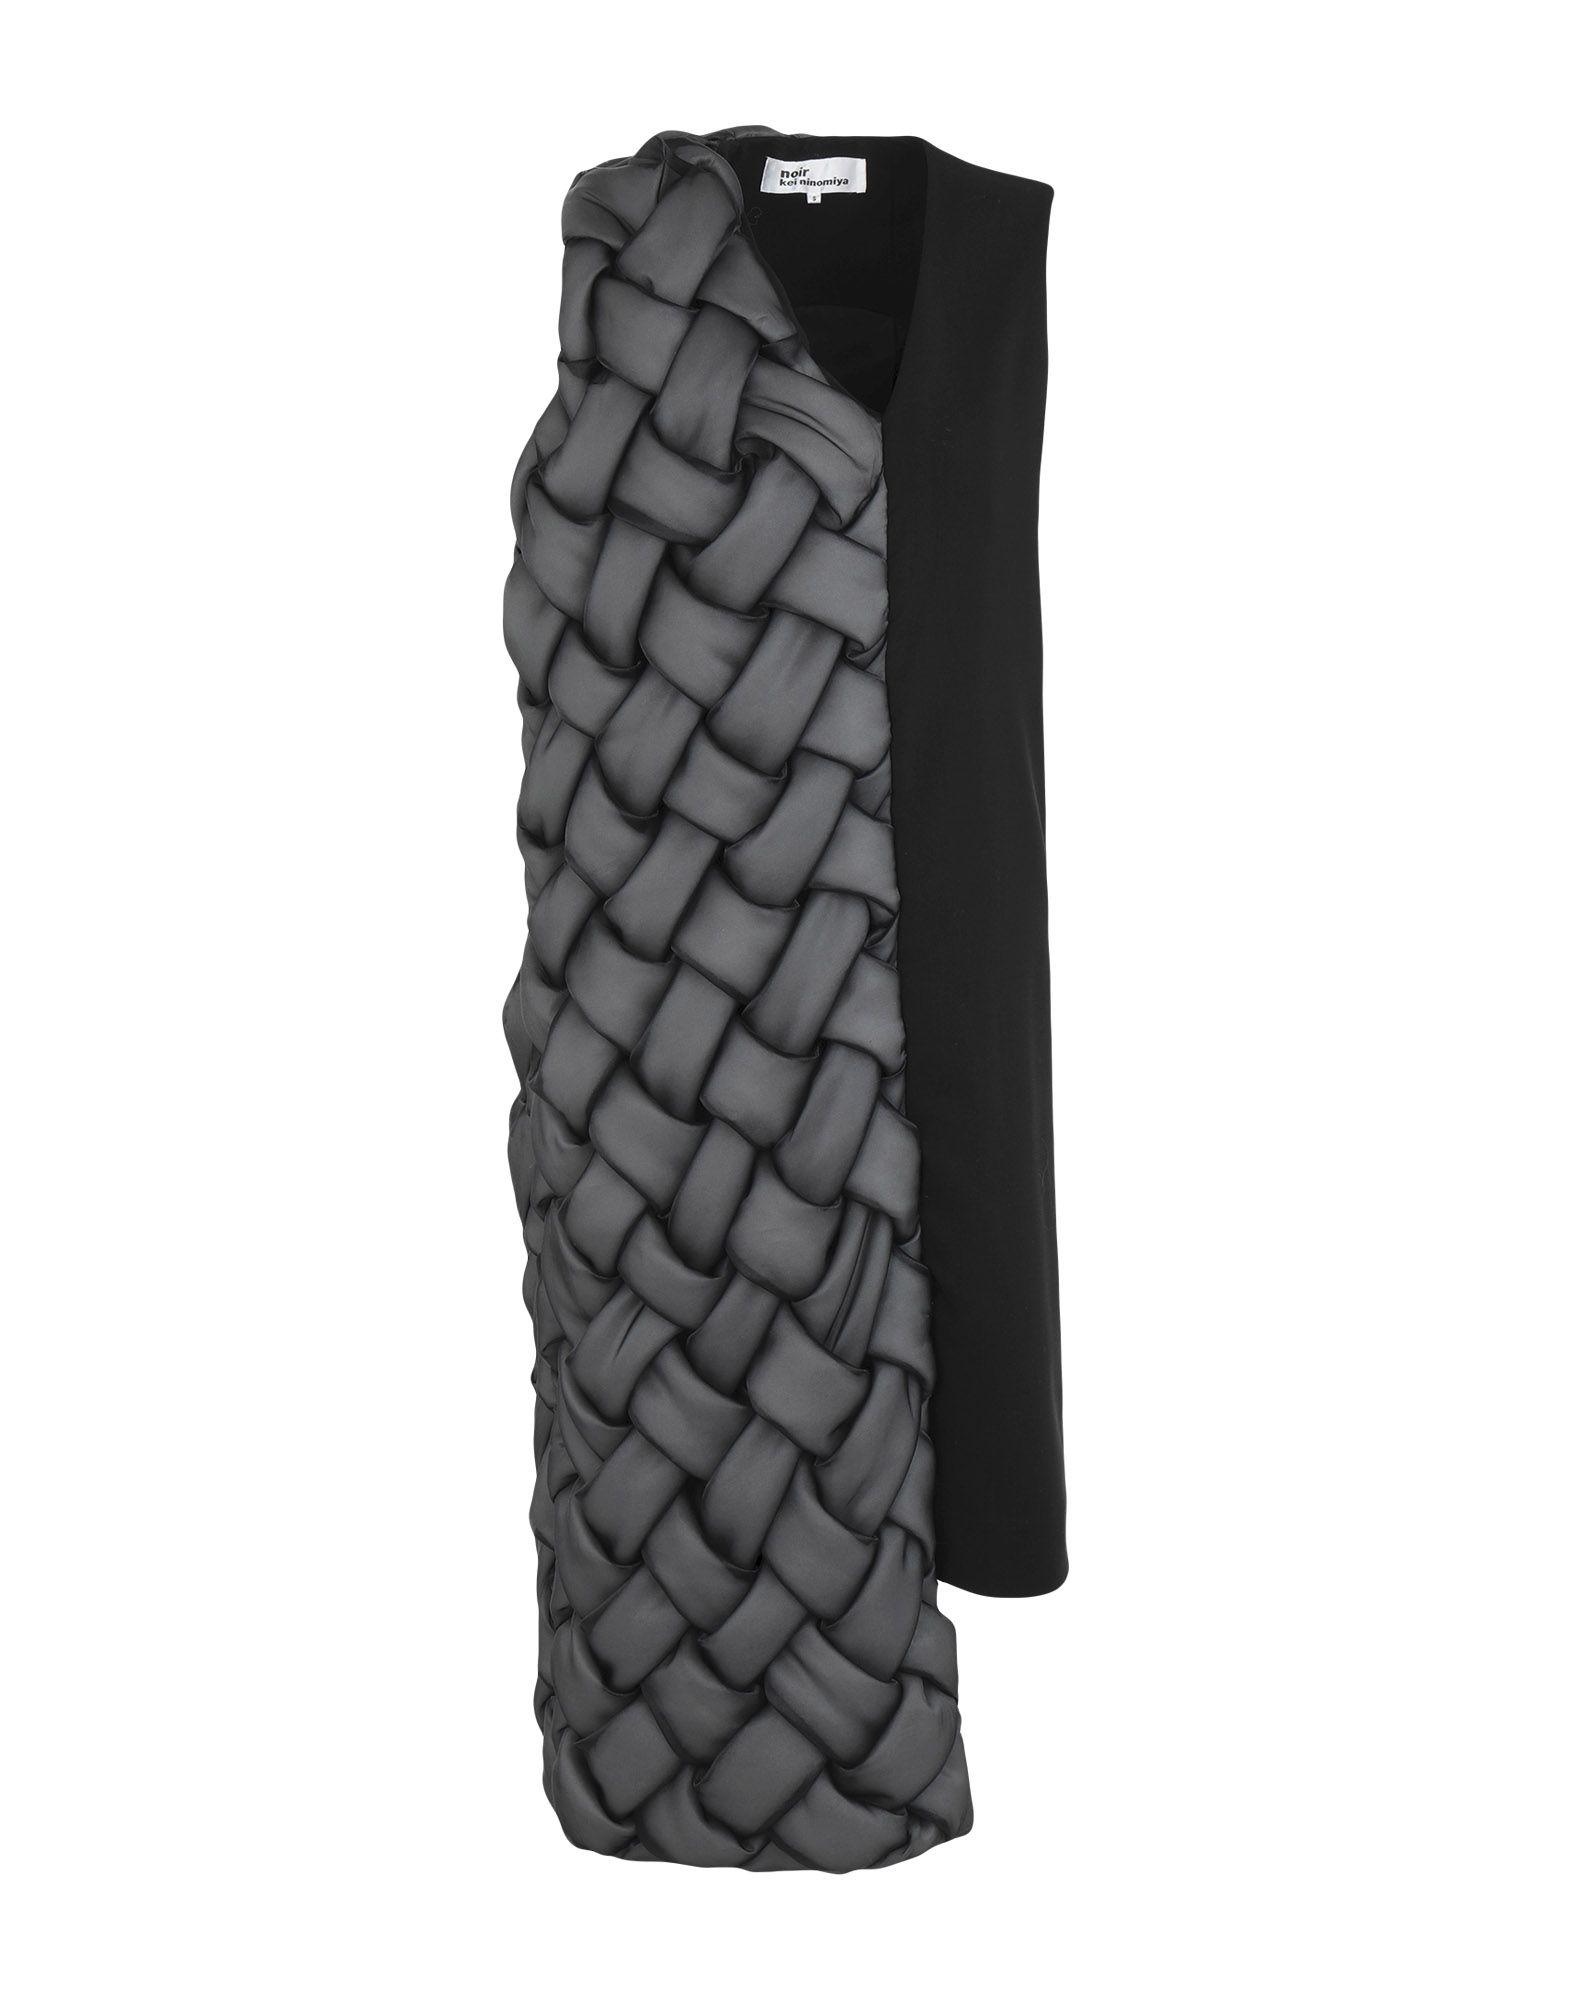 Фото - NOIR KEI NINOMIYA Платье длиной 3/4 noir kei ninomiya юбочный комбинезон